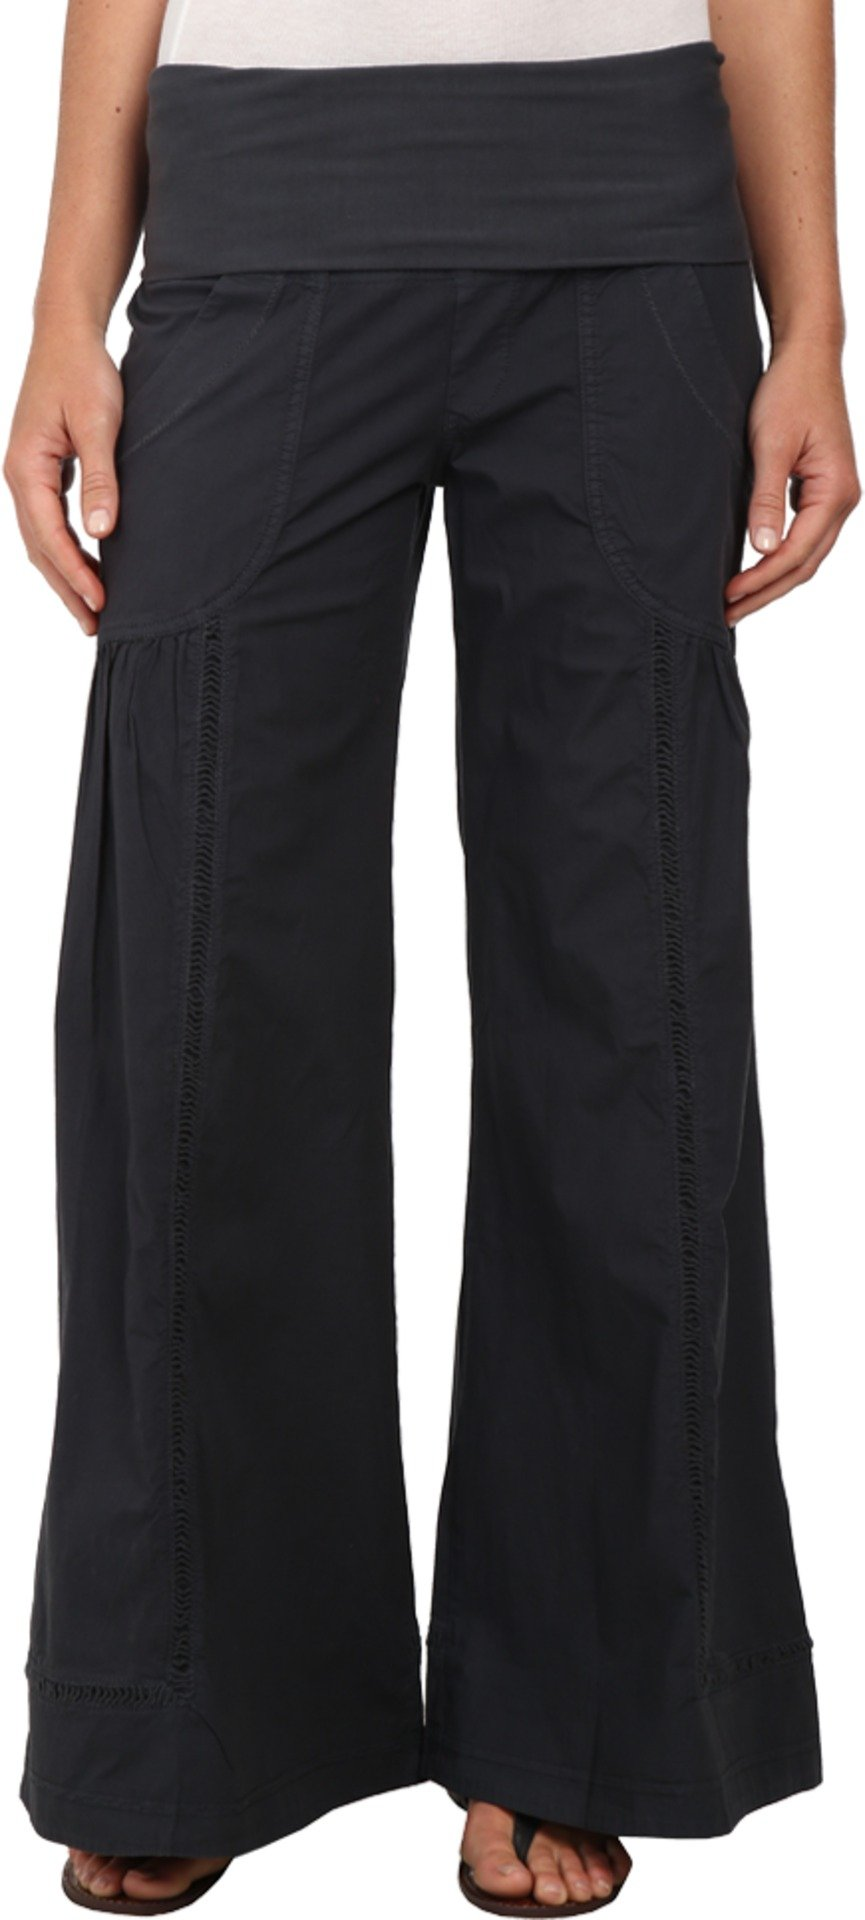 XCVI Women's Lovejoy Pant Charcoal X-Large